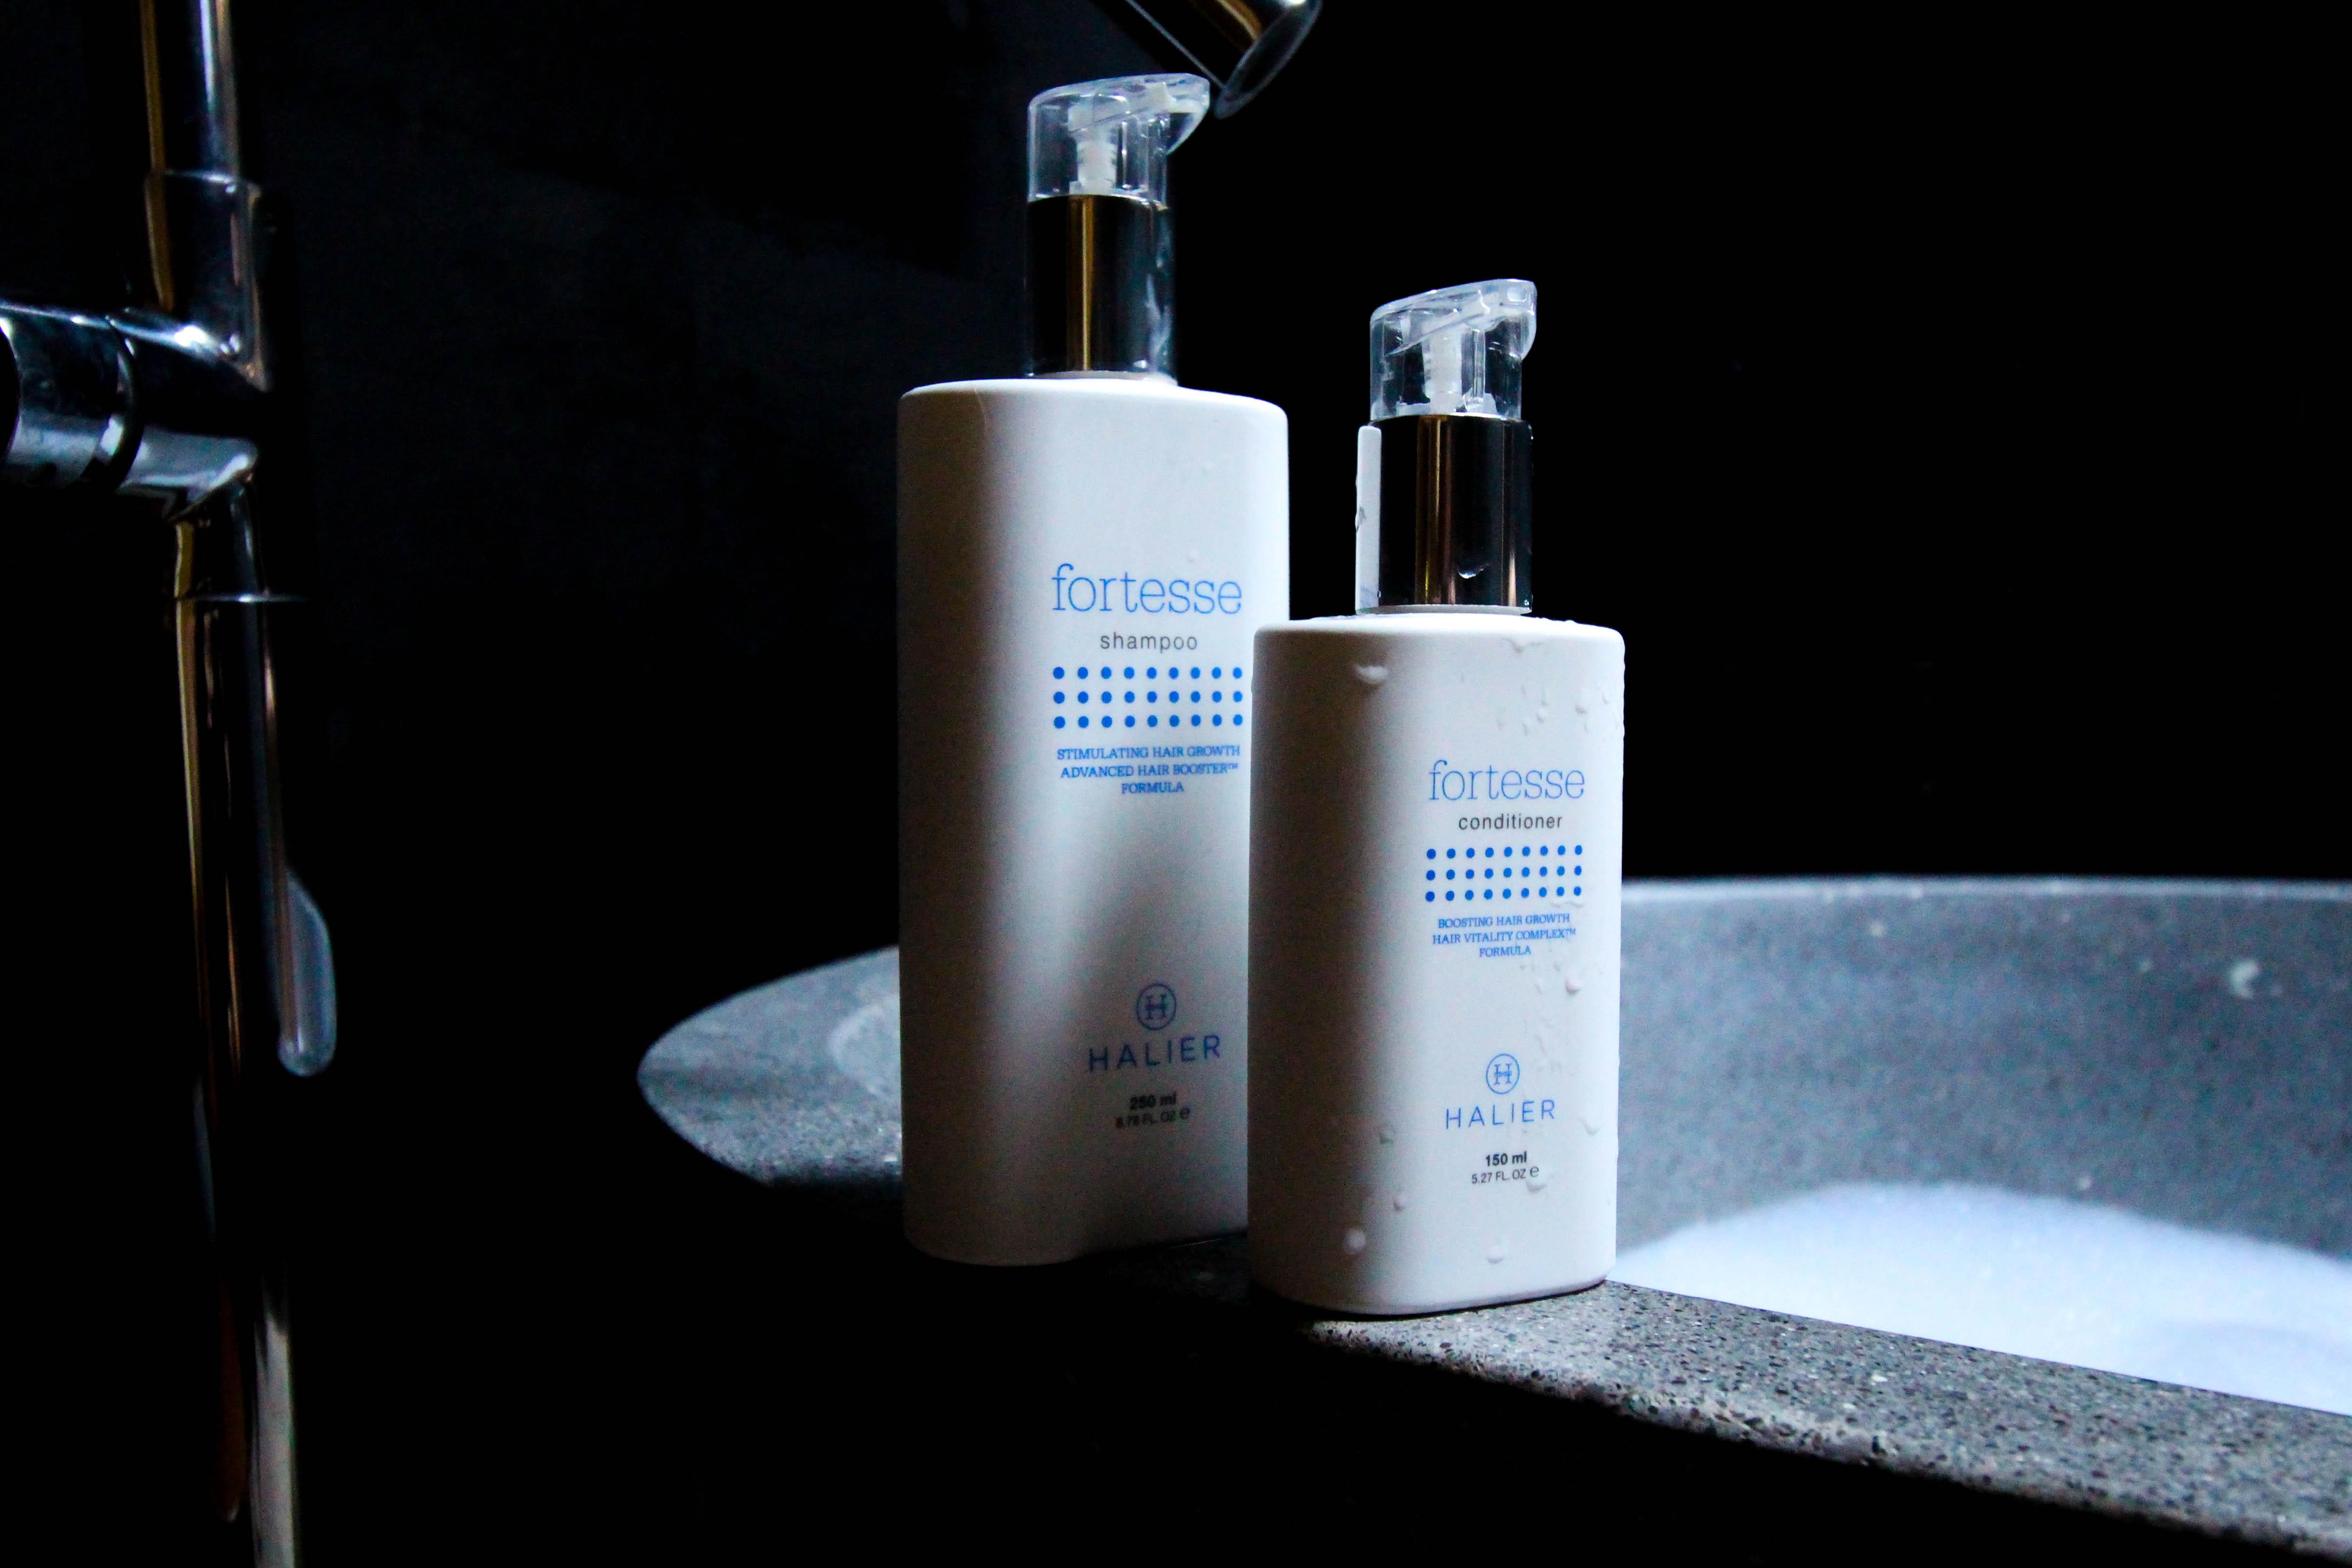 Haarpflege Halier Fortesse Shampoo Conditioner Test gesundes kräftiges Haar Beauty Blog Bali 3